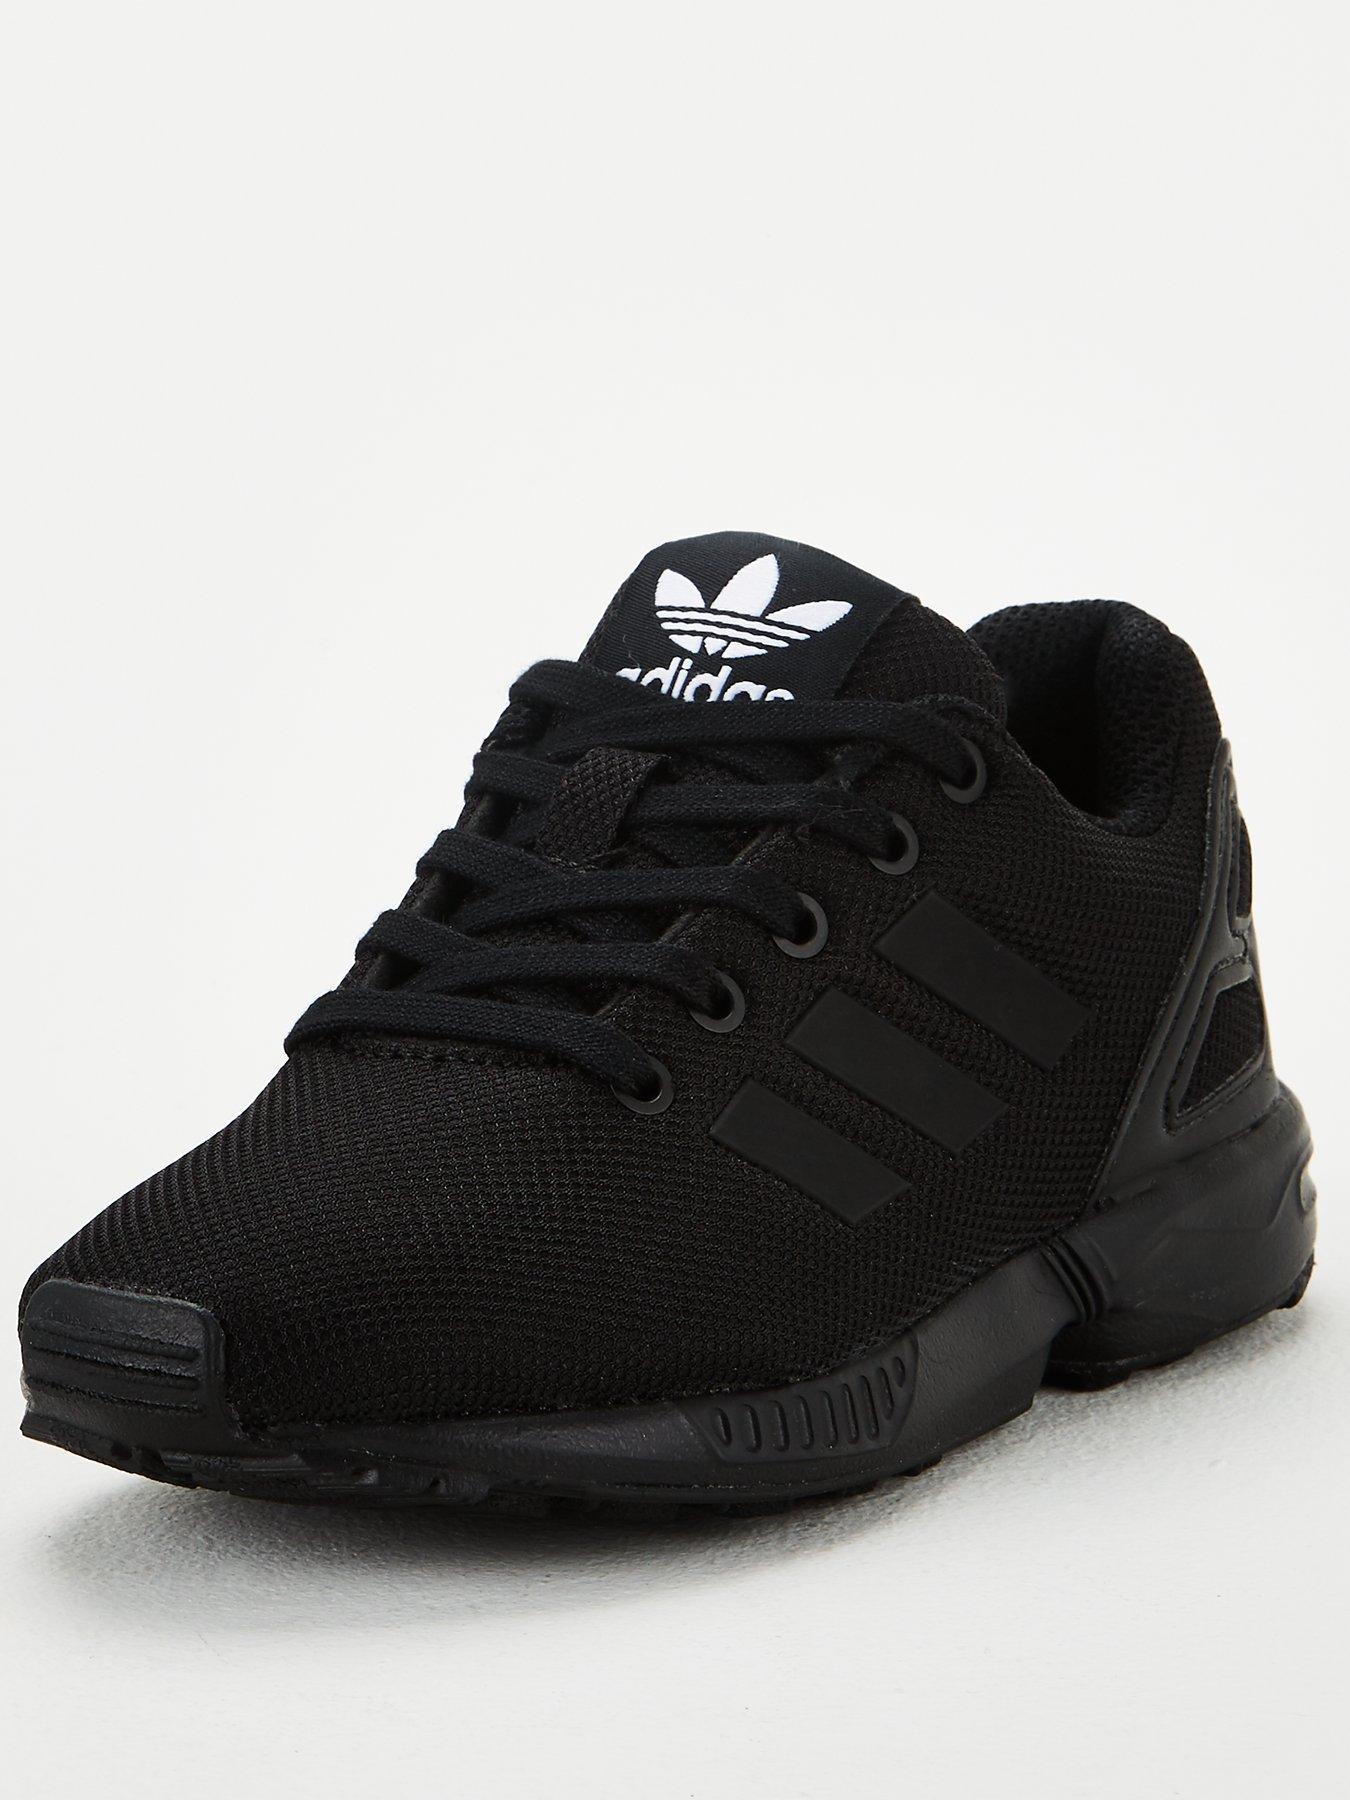 boys adidas velcro trainers 31c1aa